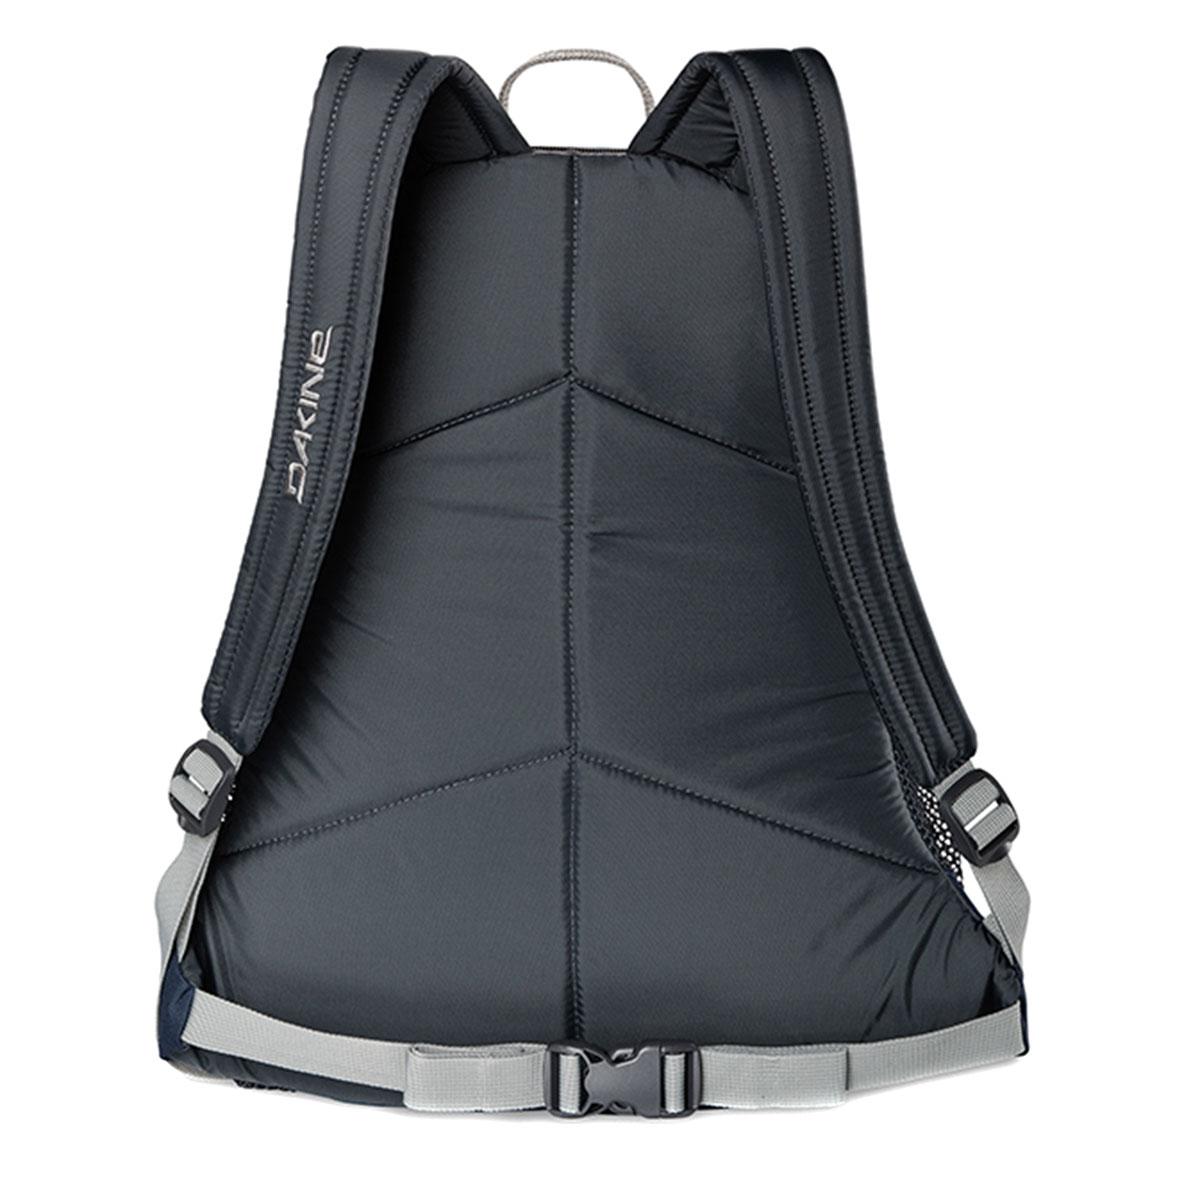 254e7fe61f76 Купить рюкзак спортивный Dakine Wonder 15 L Stratus в интернет ...